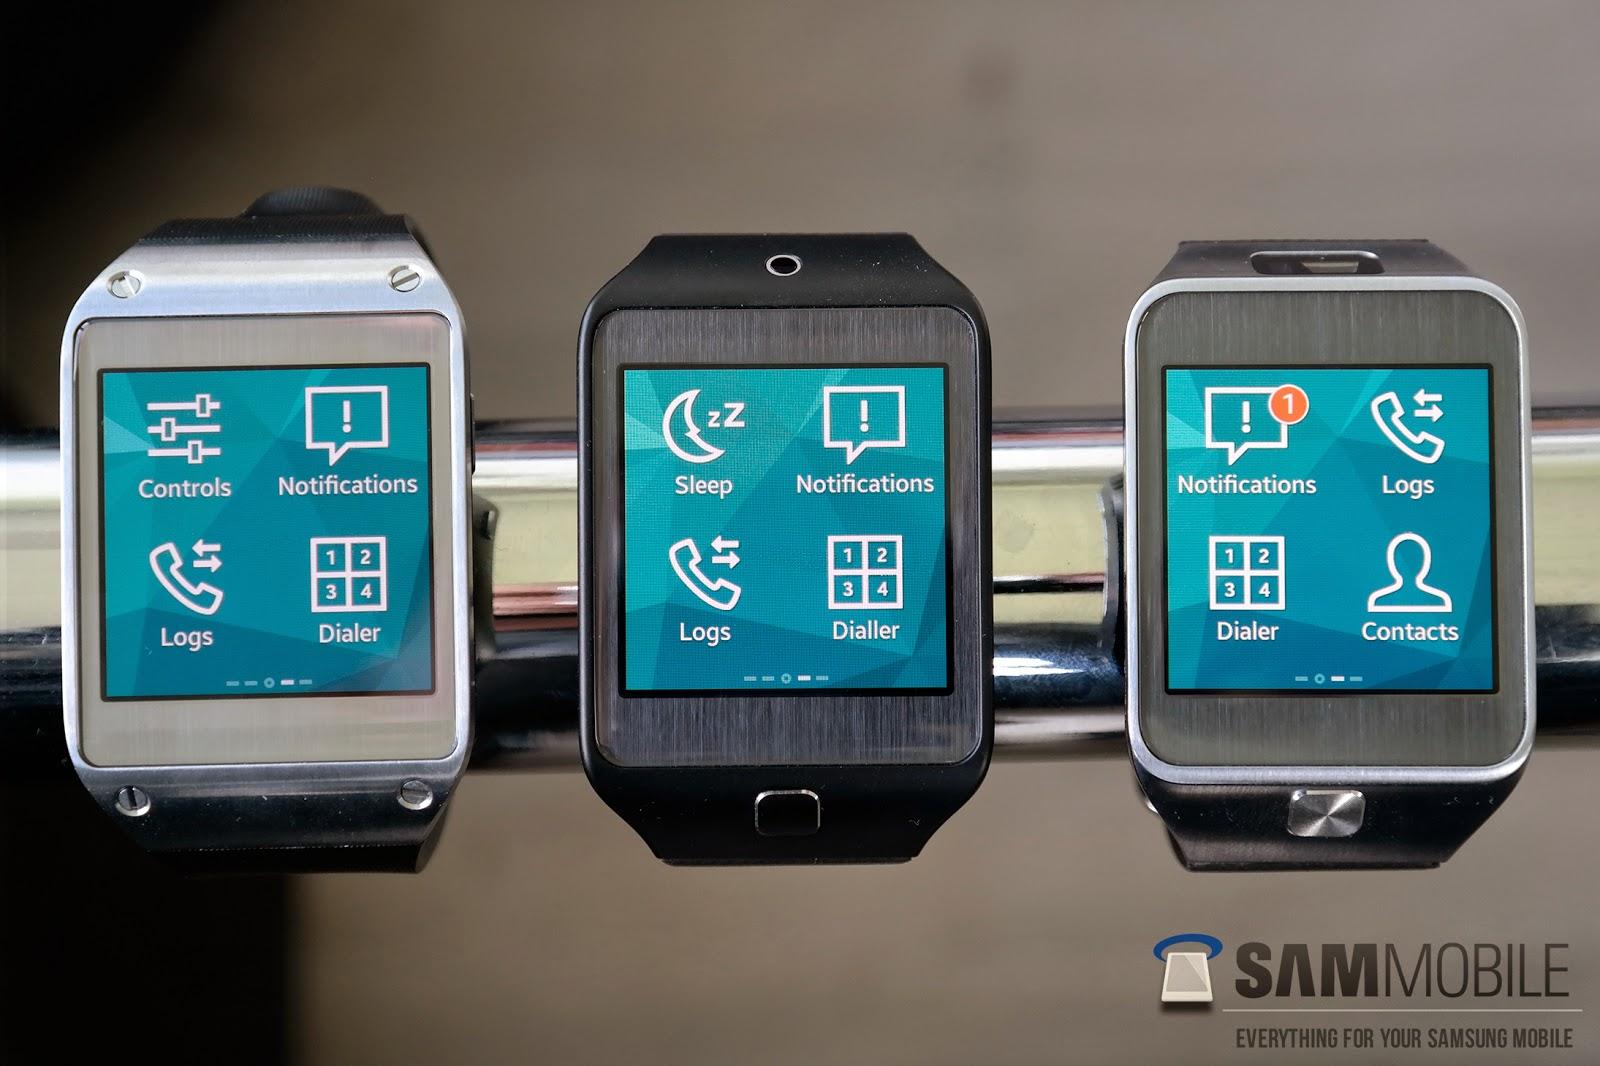 Galaxy Gear - Tizen OS